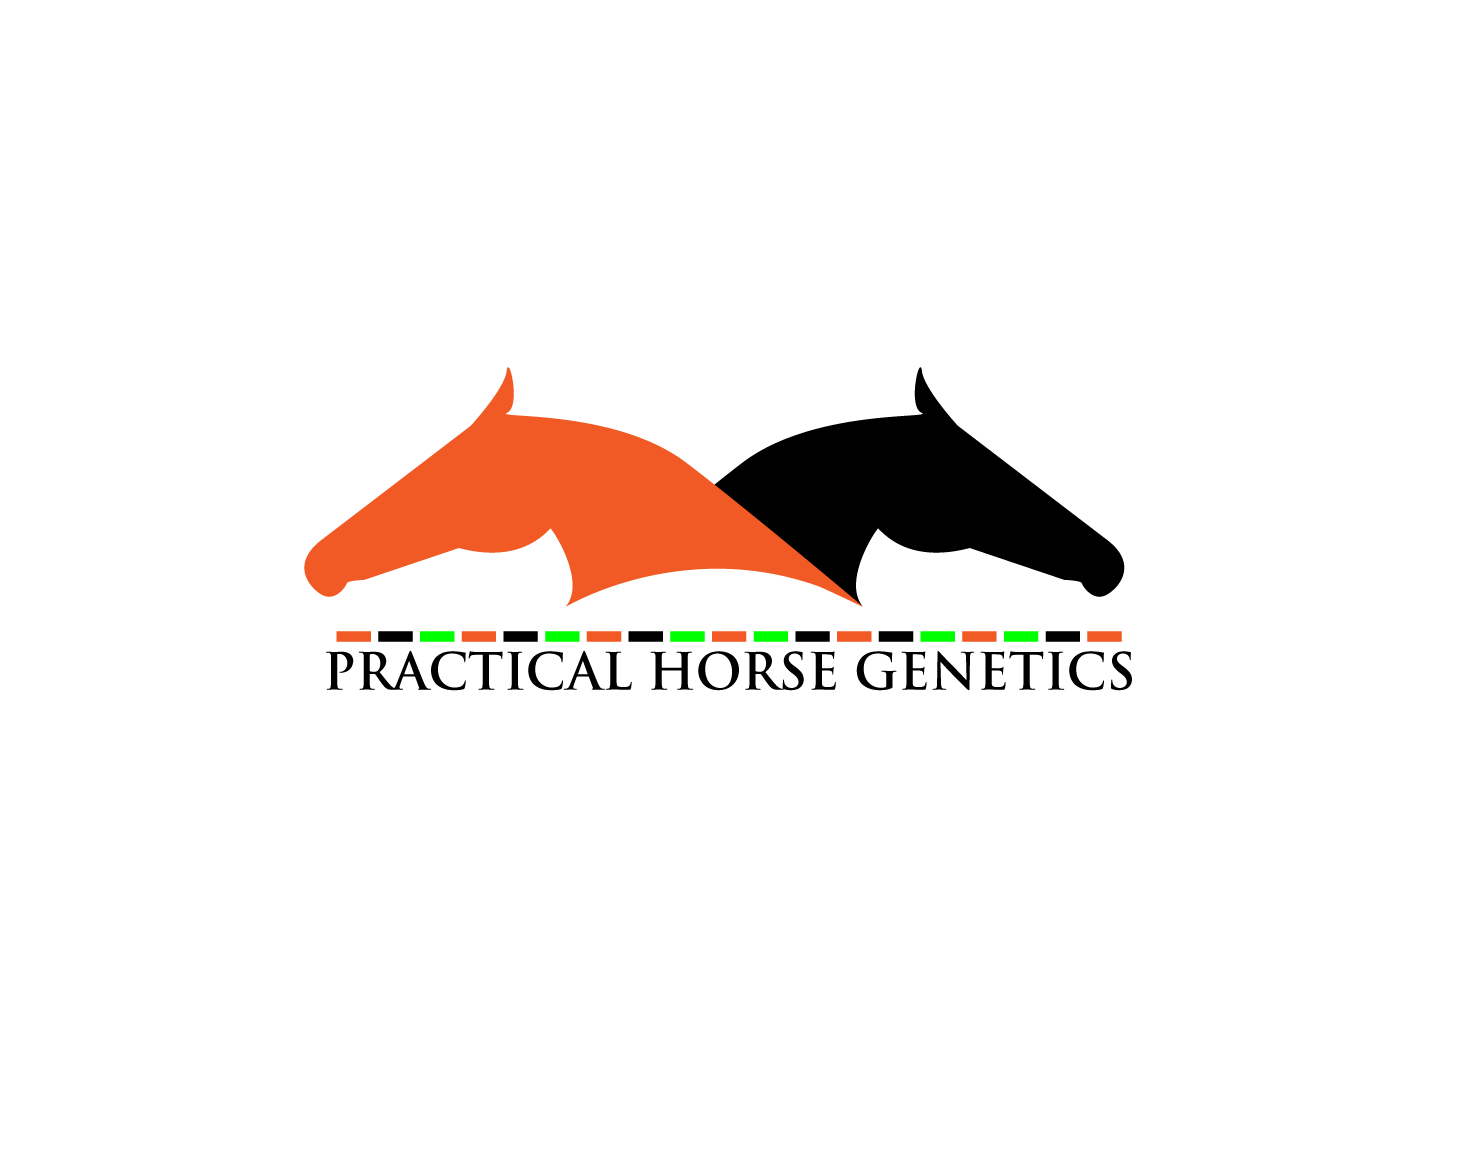 logo for Practical Horse Genetics